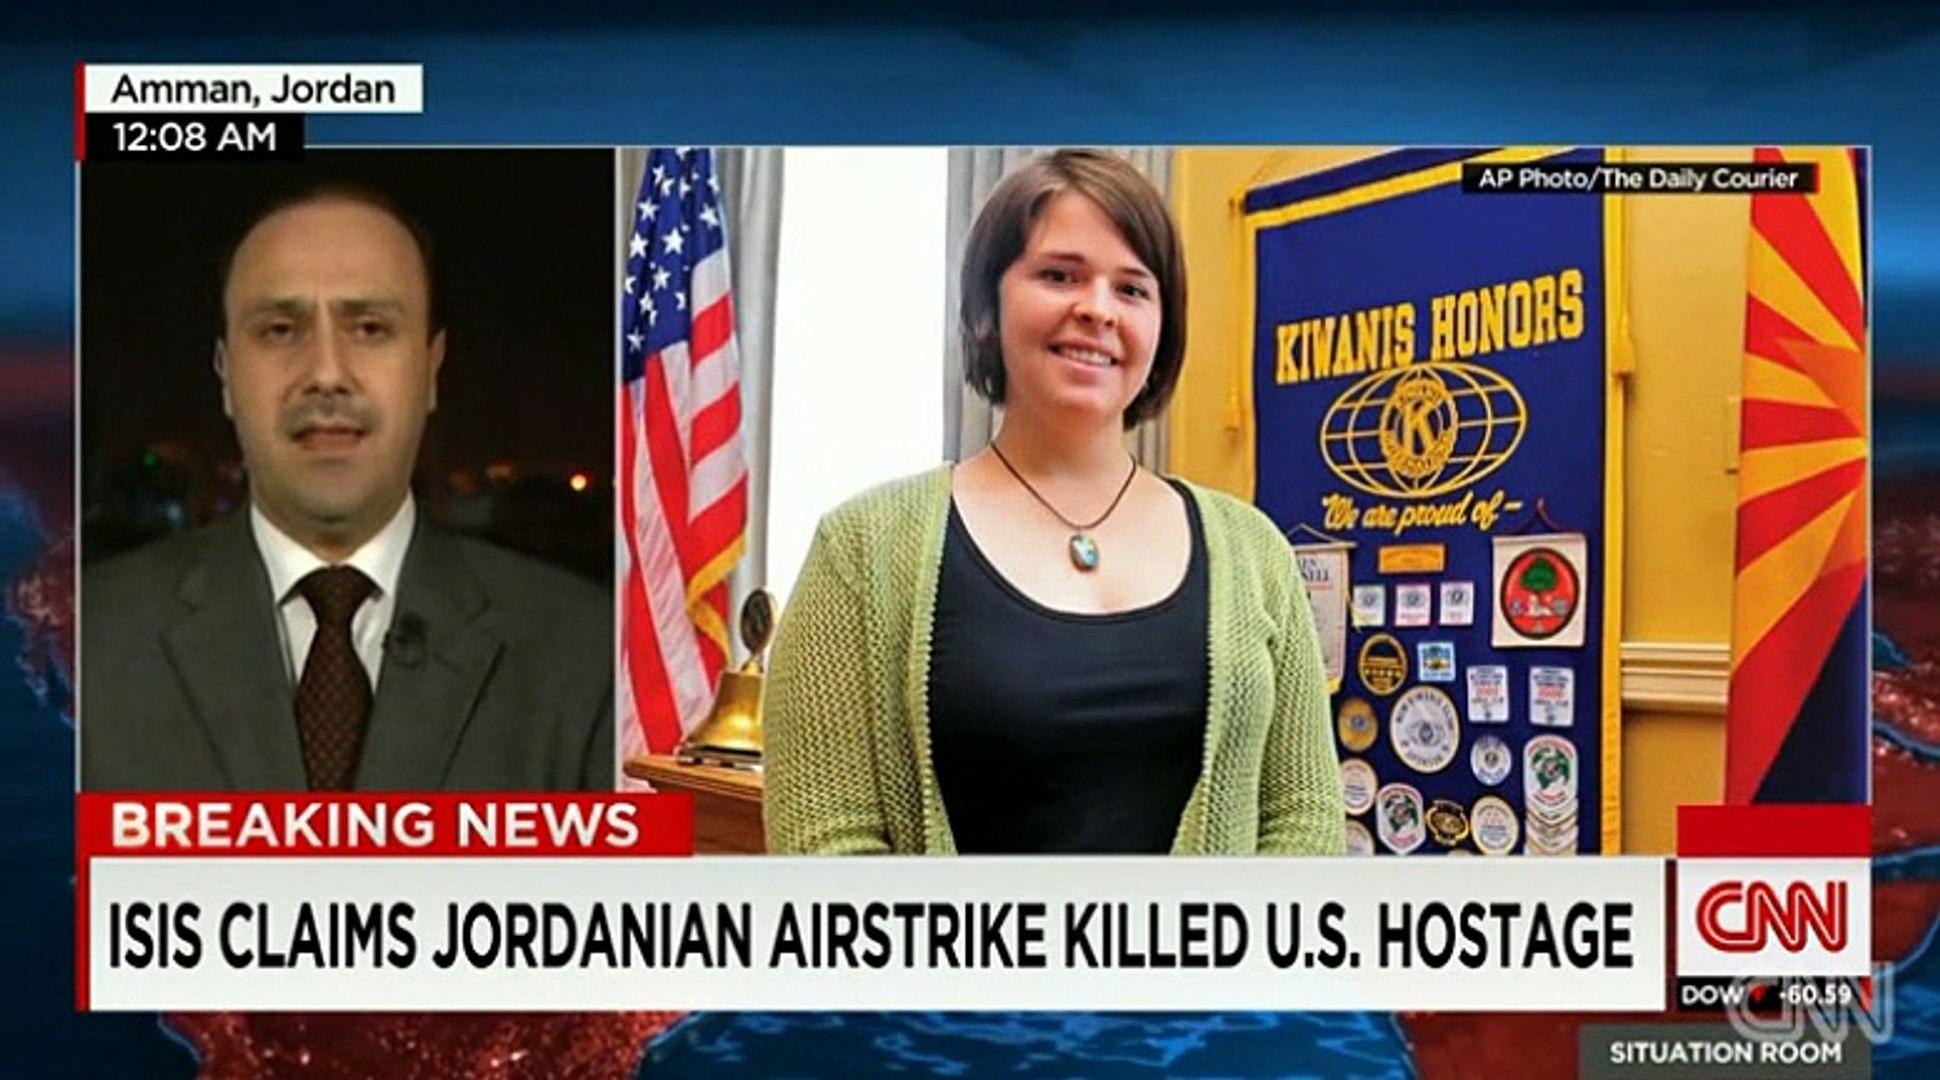 ISIS and Daish Claim Jordainian Air Strike Killed U.S. Hostage